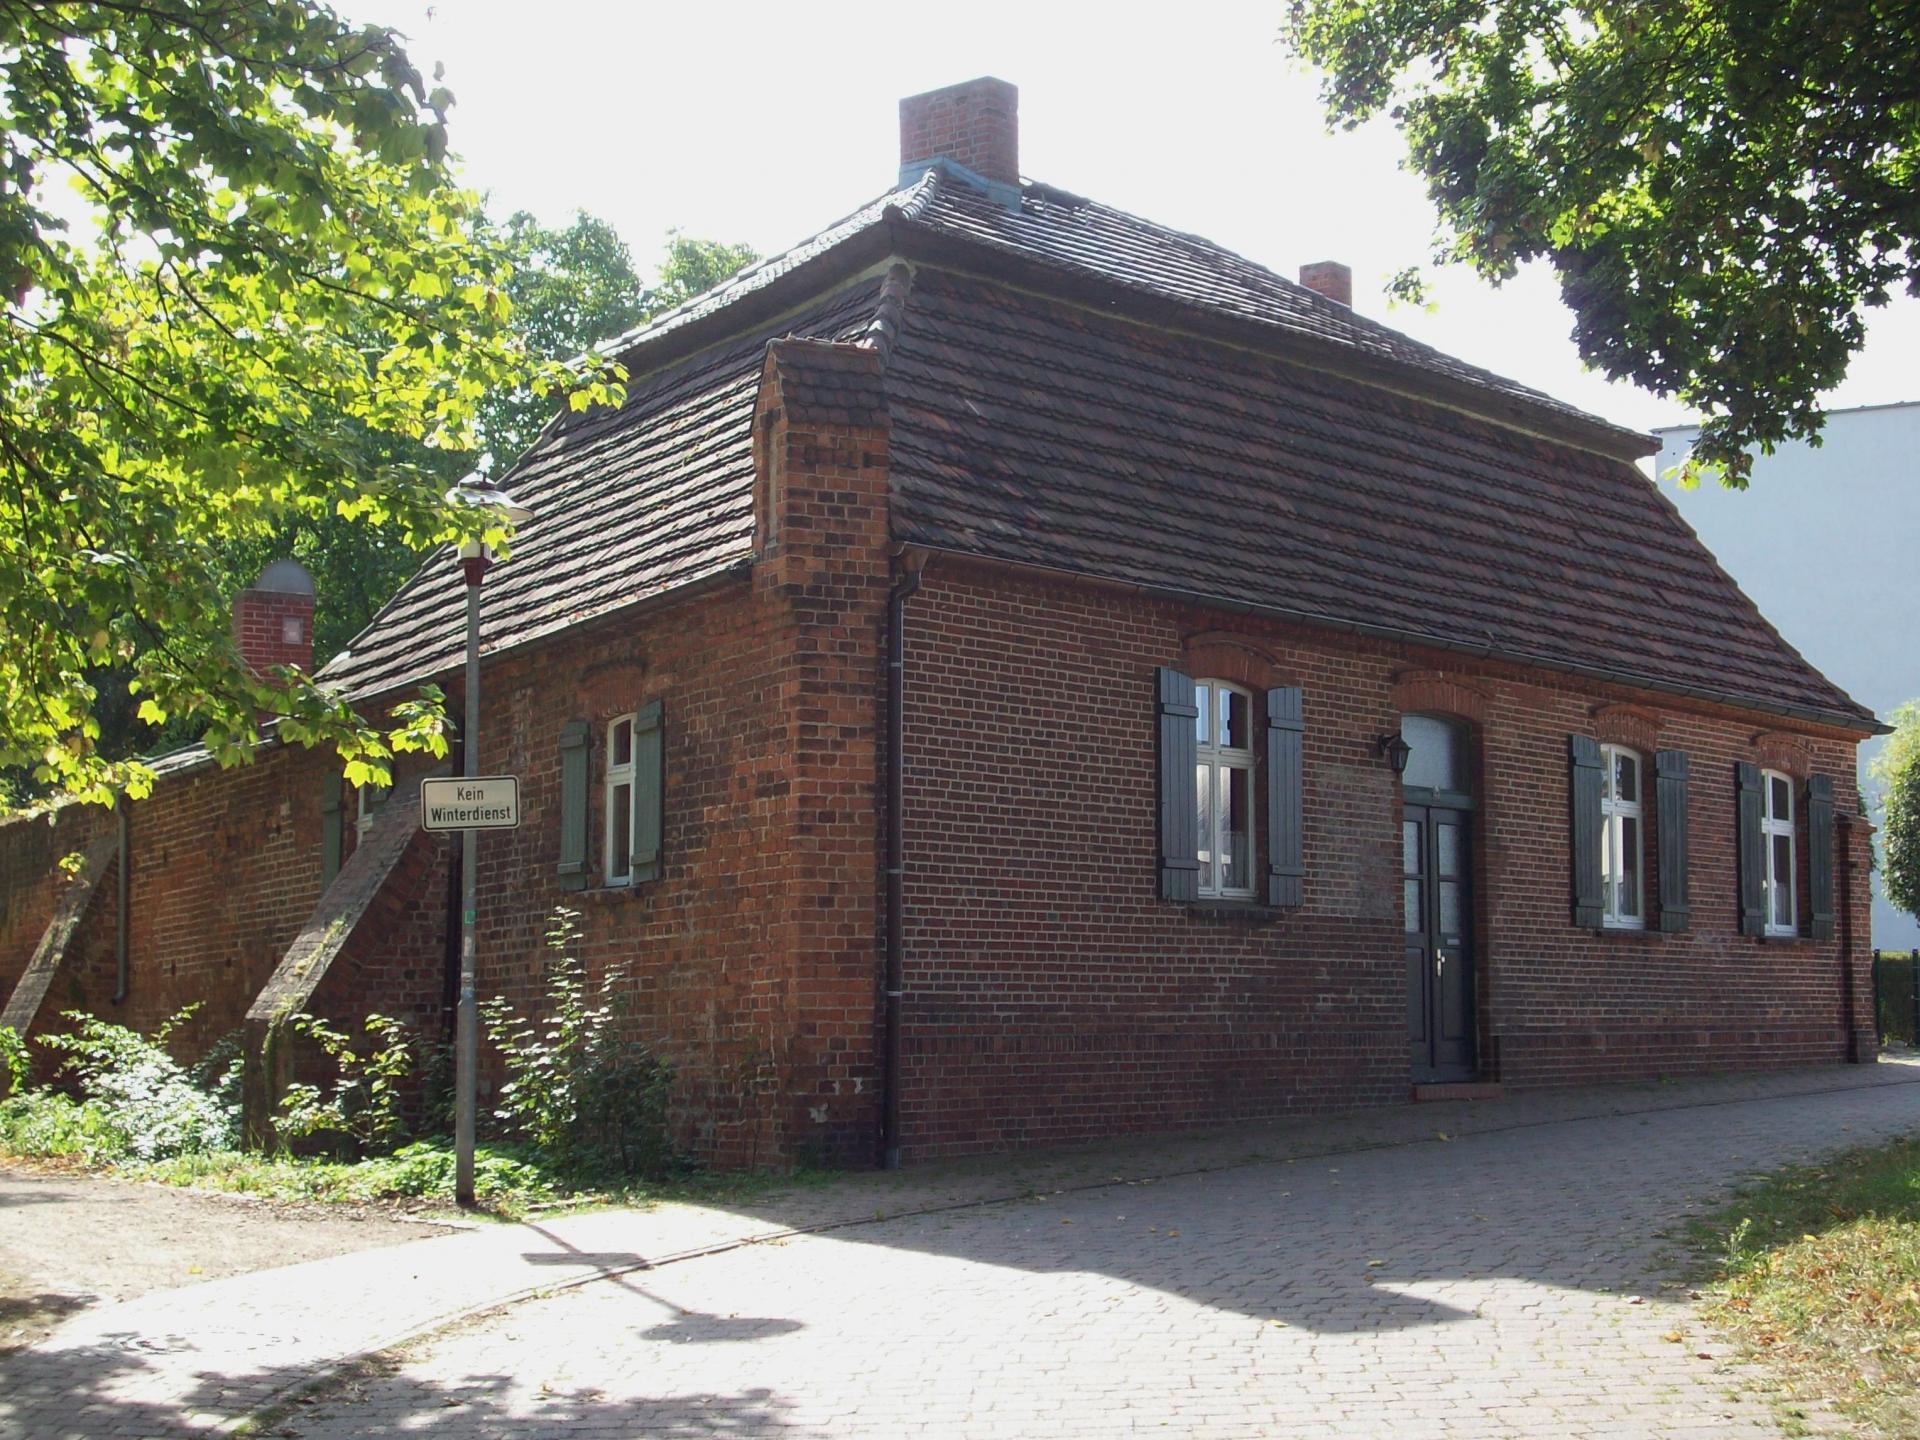 Ziegelmeisterhaus